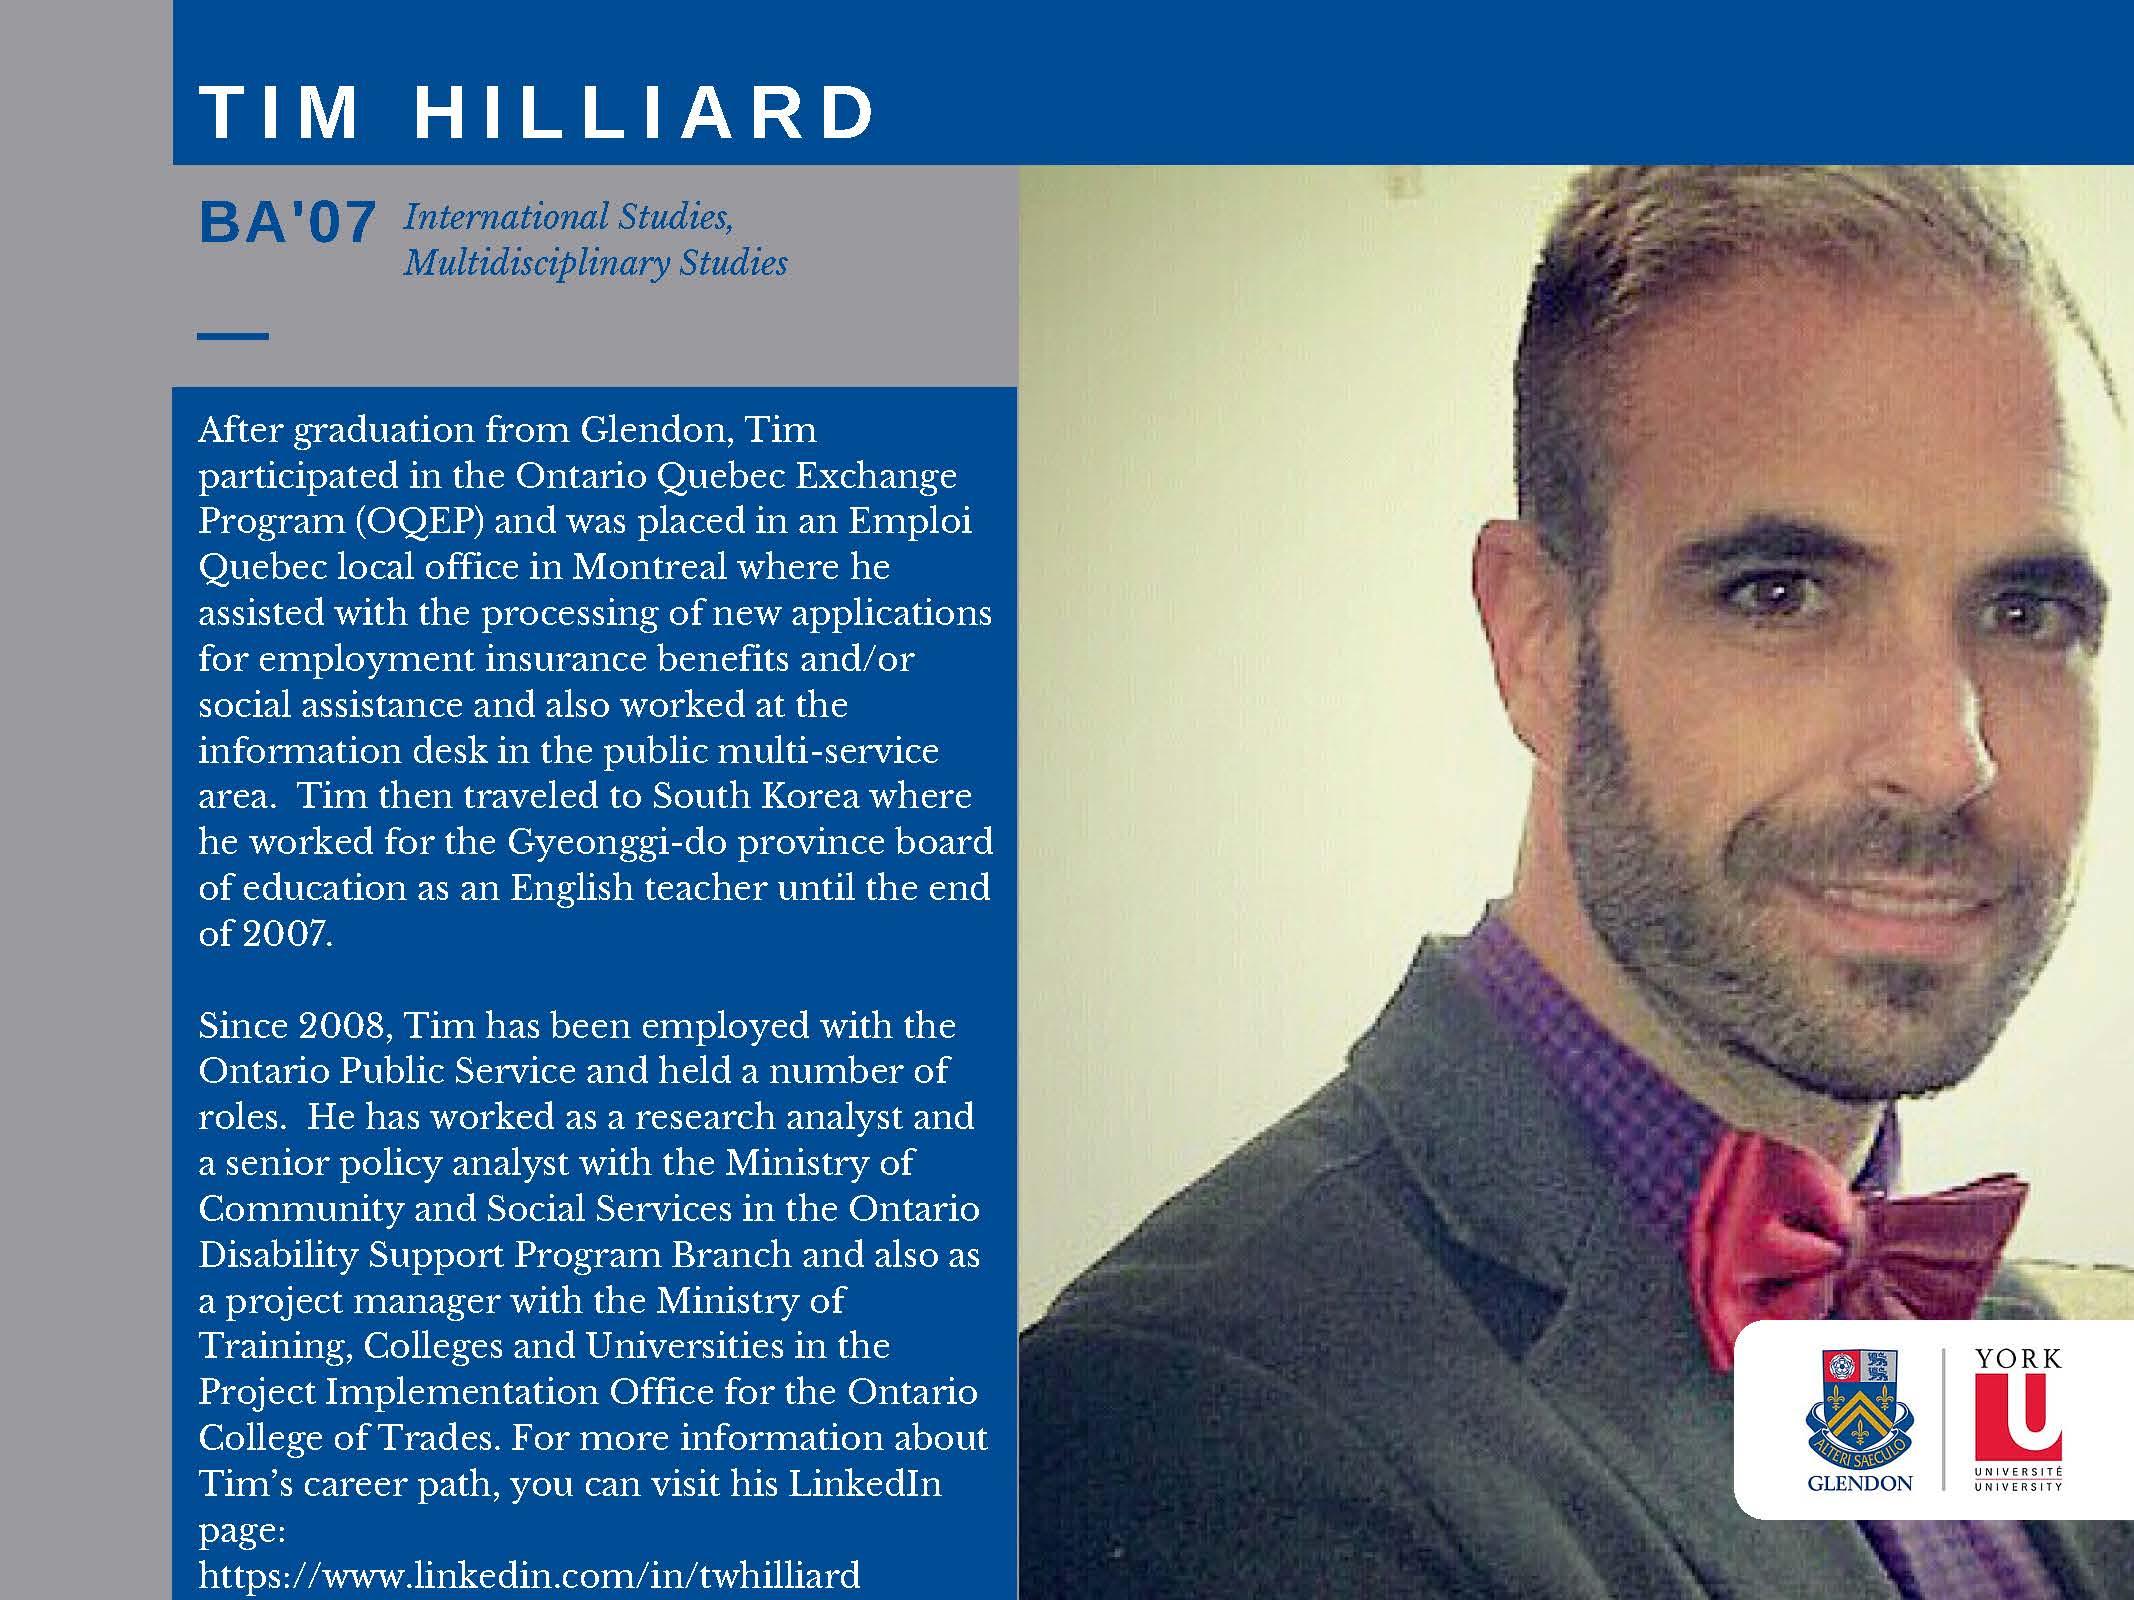 Timothy HilliardEN